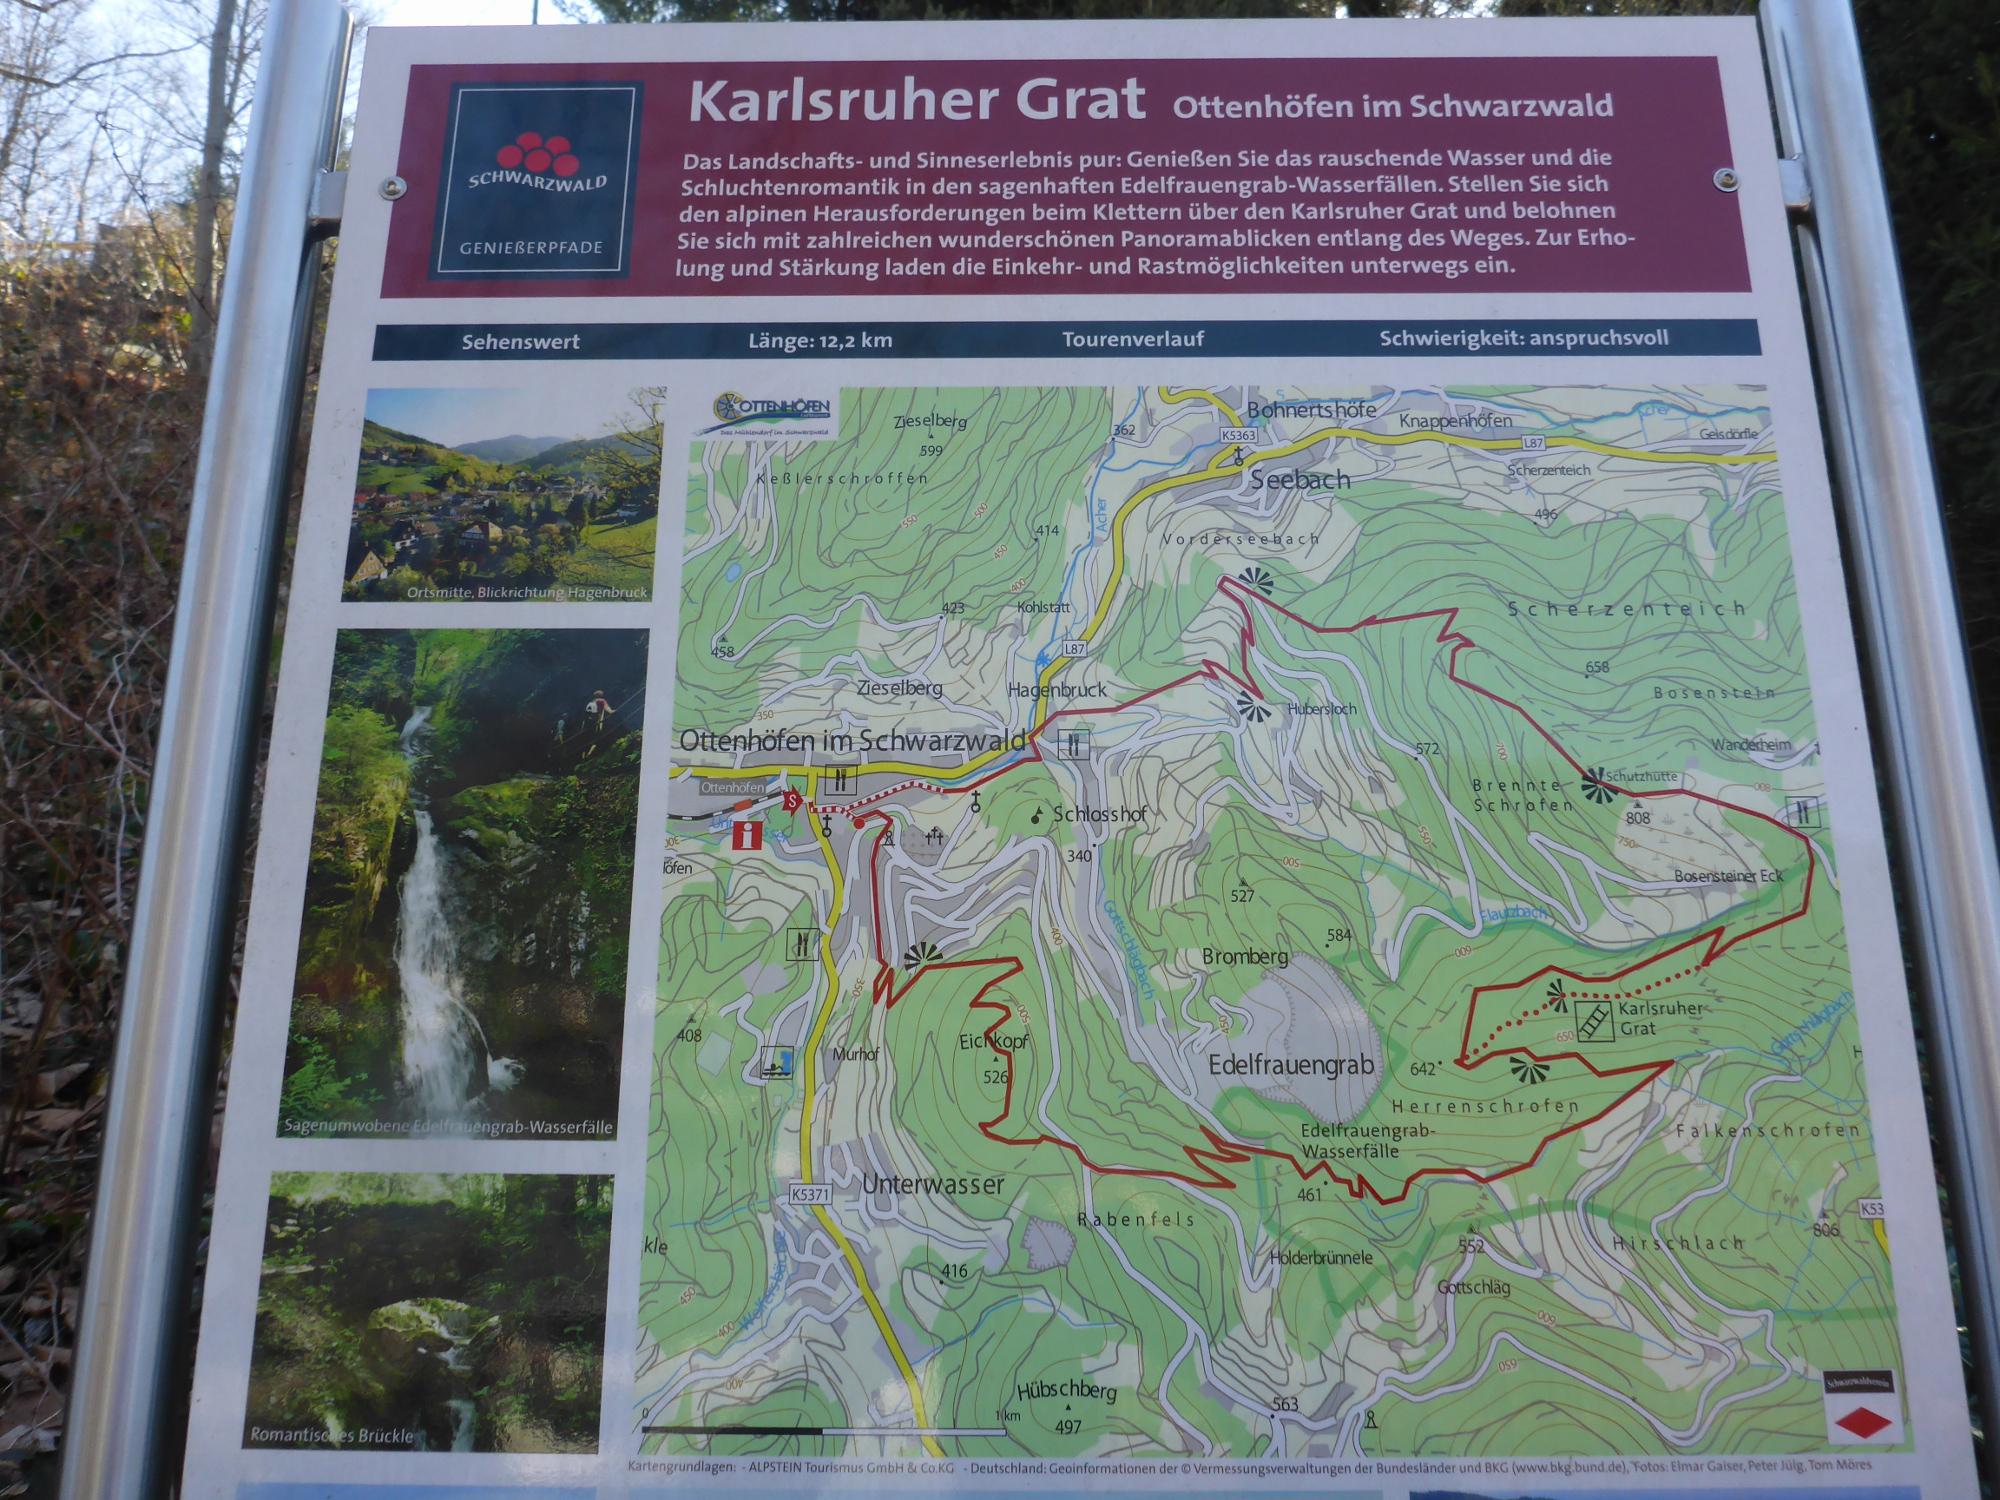 Karlsruher Grat Karte